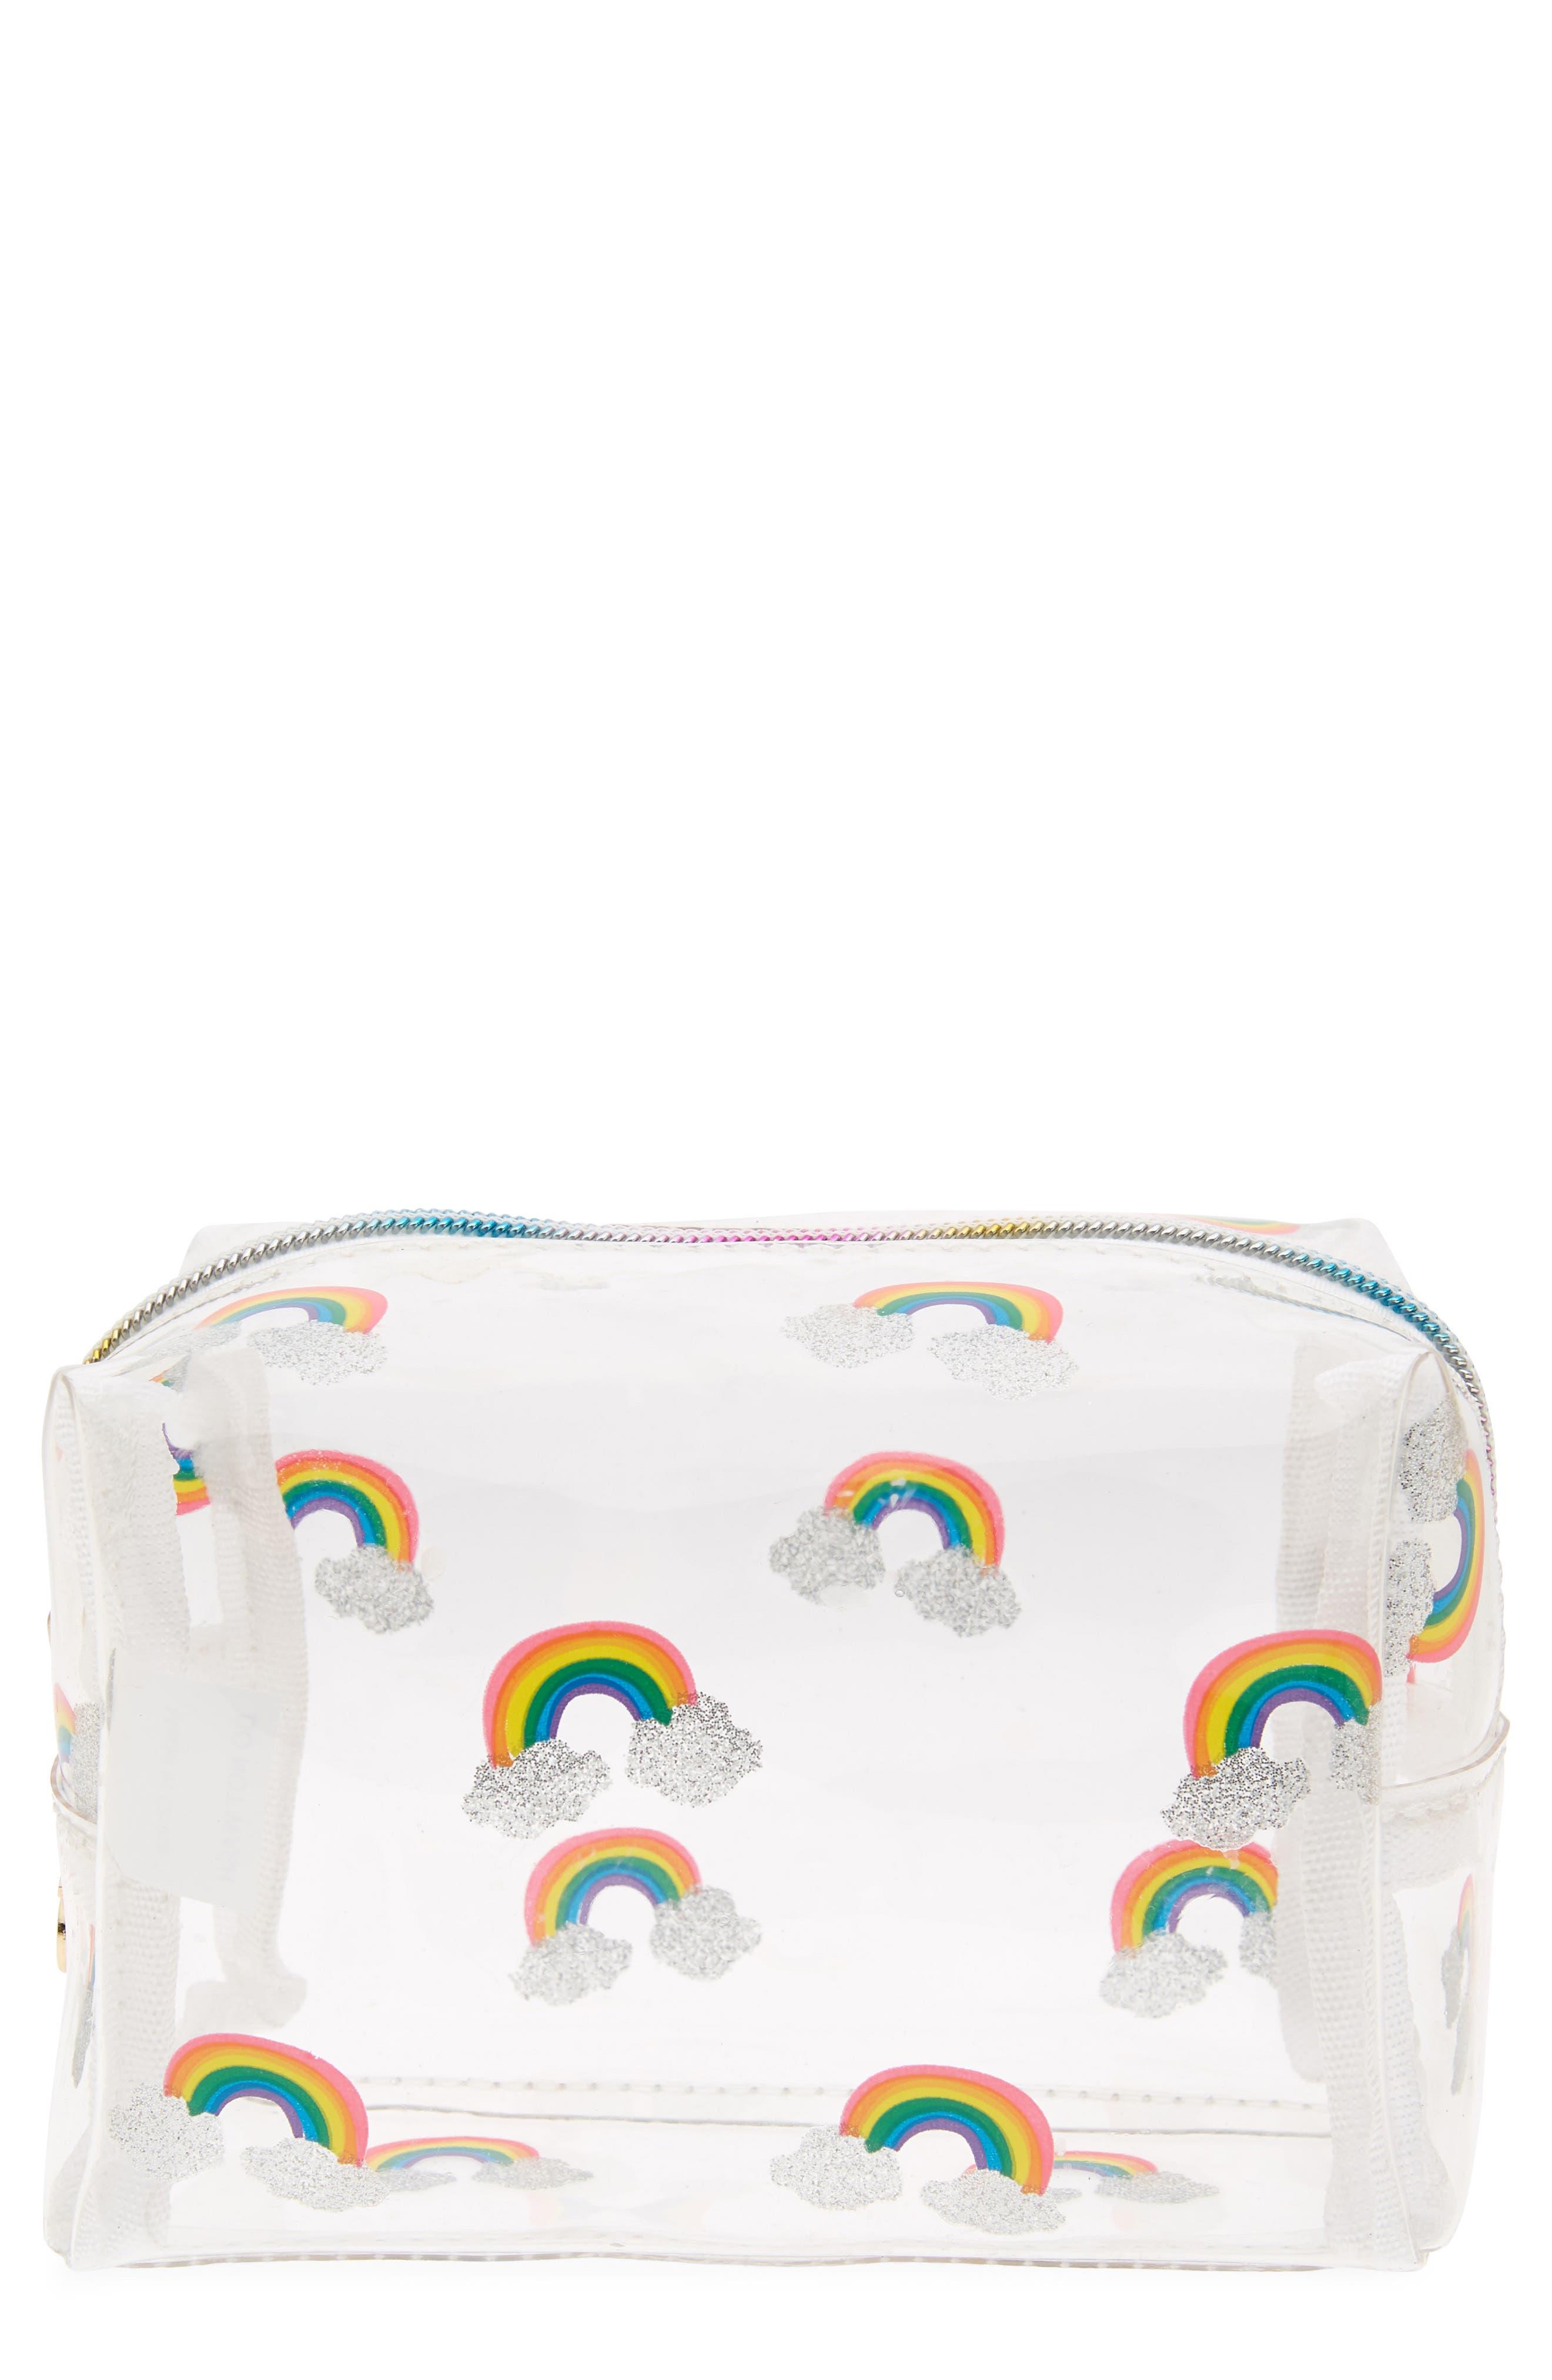 Rainbow Cosmetics Bag,                         Main,                         color, Multi